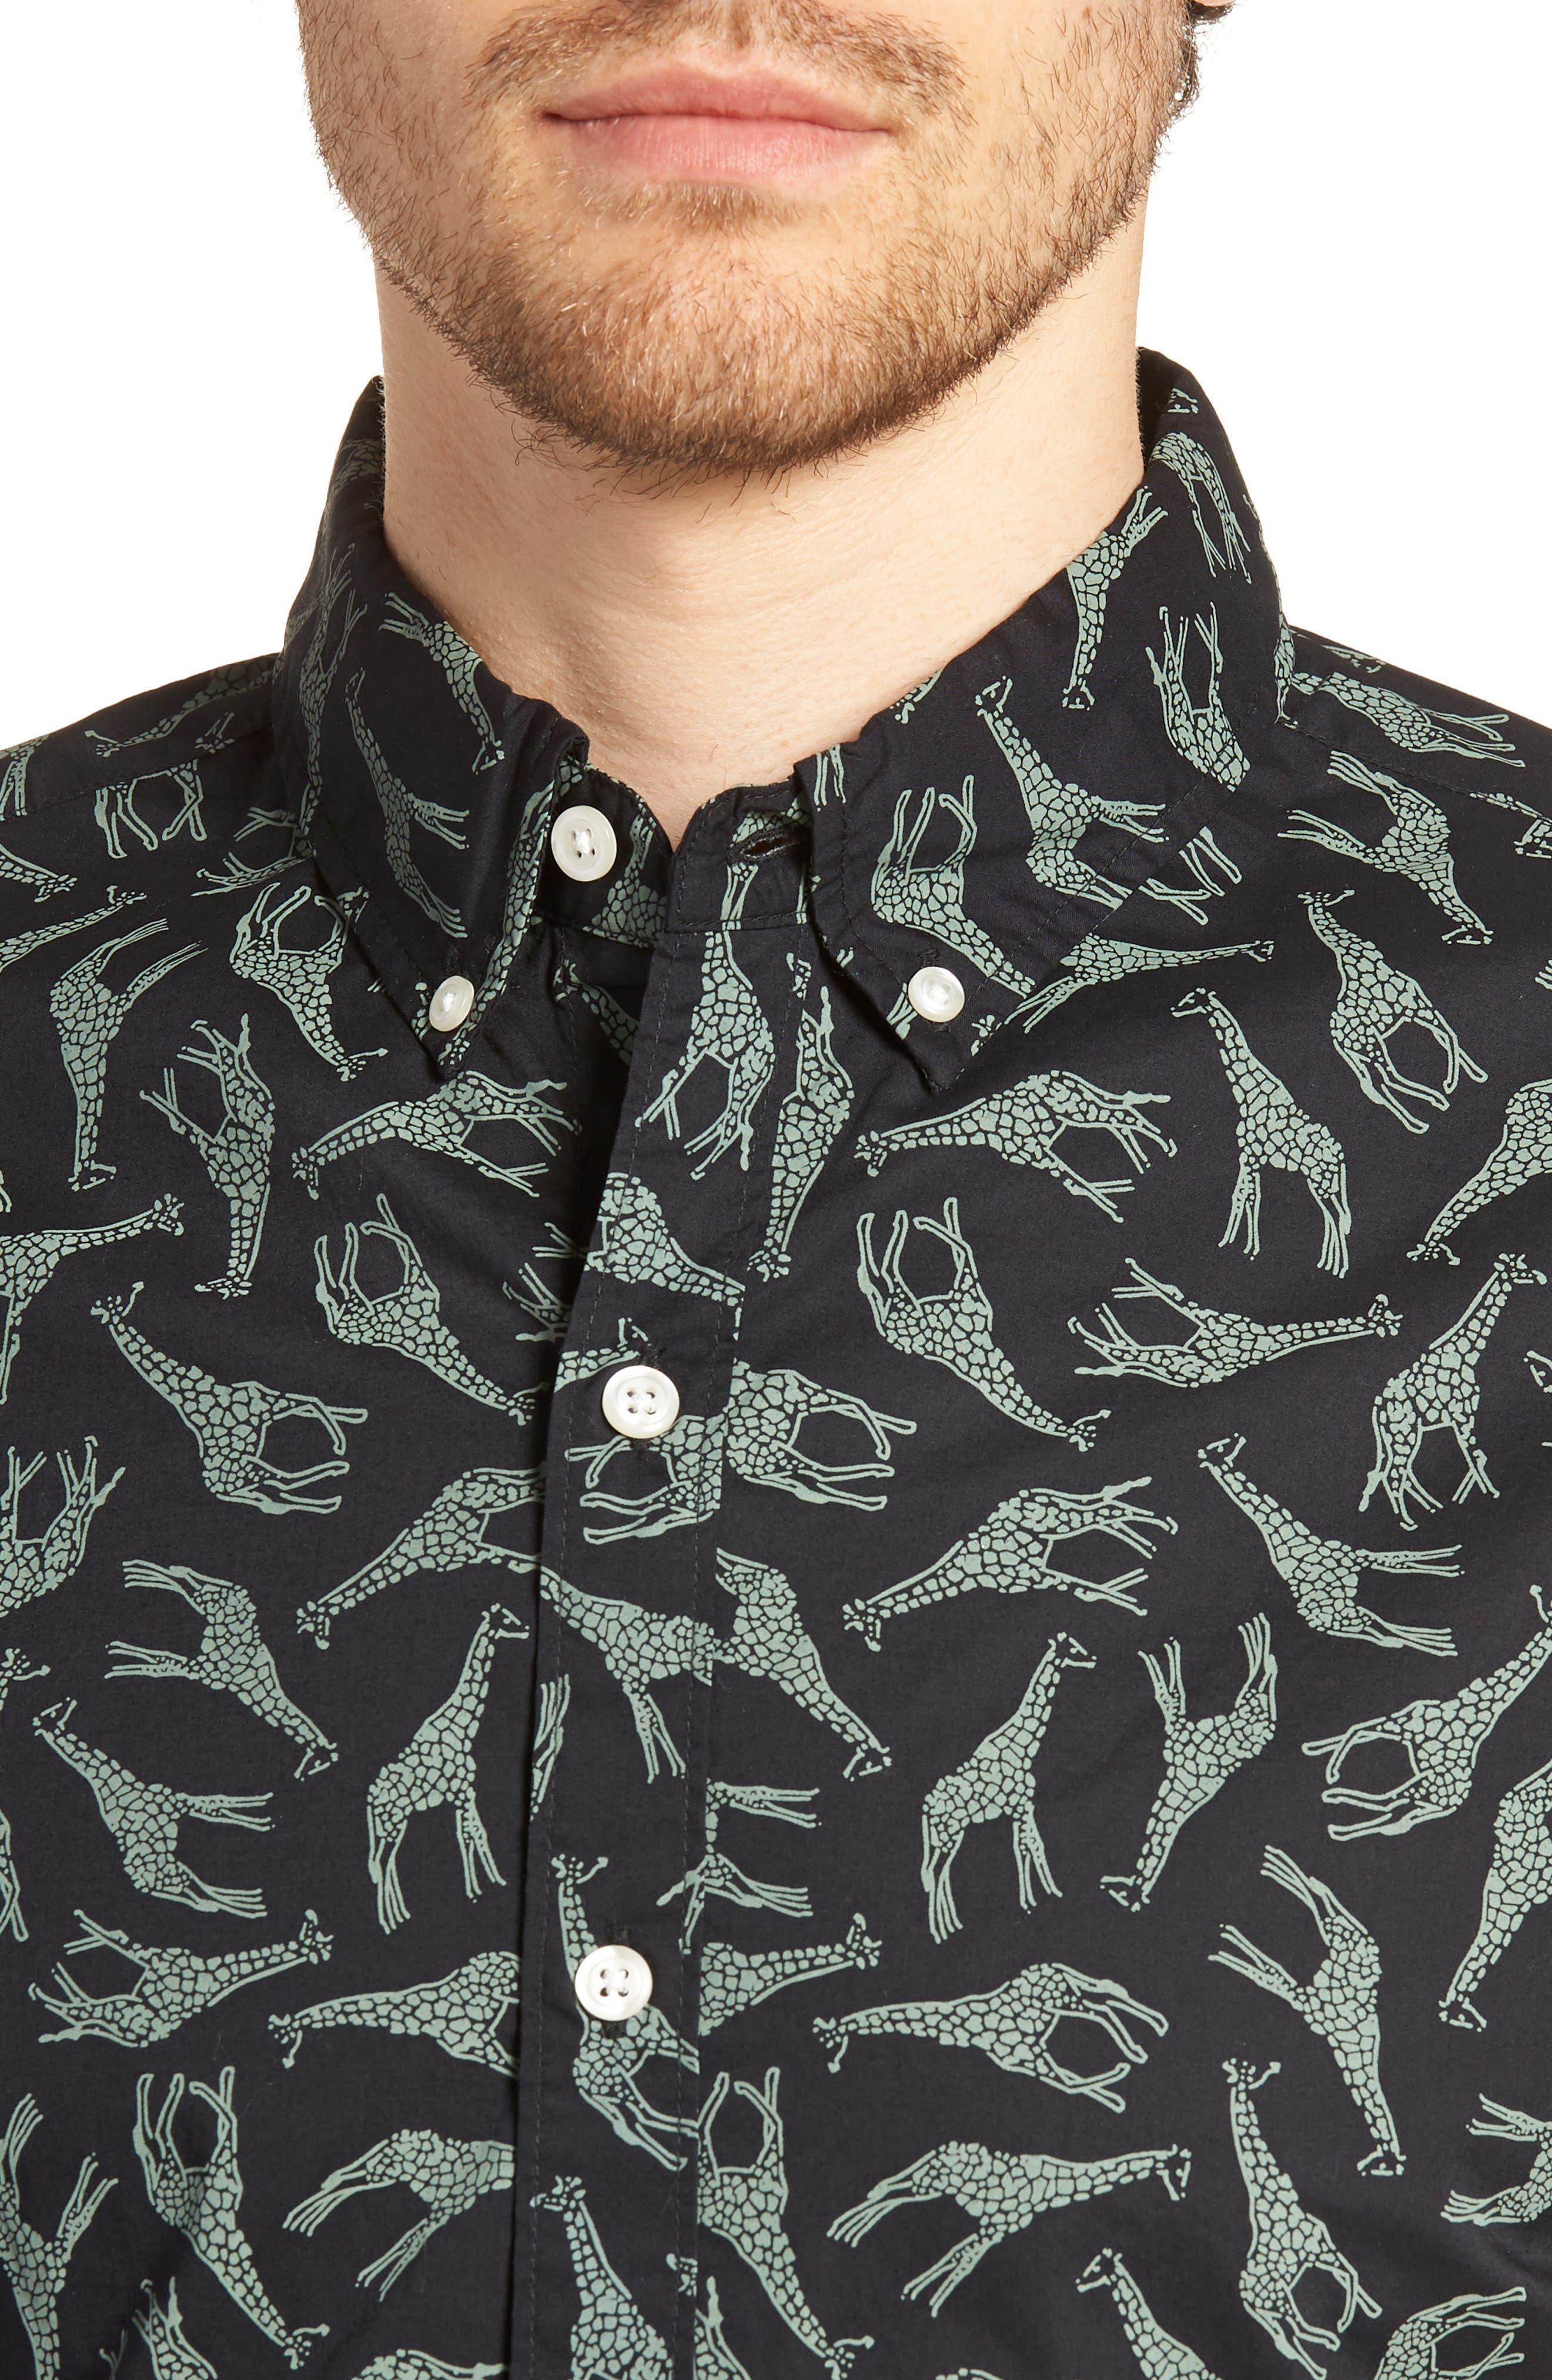 BONOBOS,                             Riviera Slim Fit Giraffe Print Sport Shirt,                             Alternate thumbnail 4, color,                             001